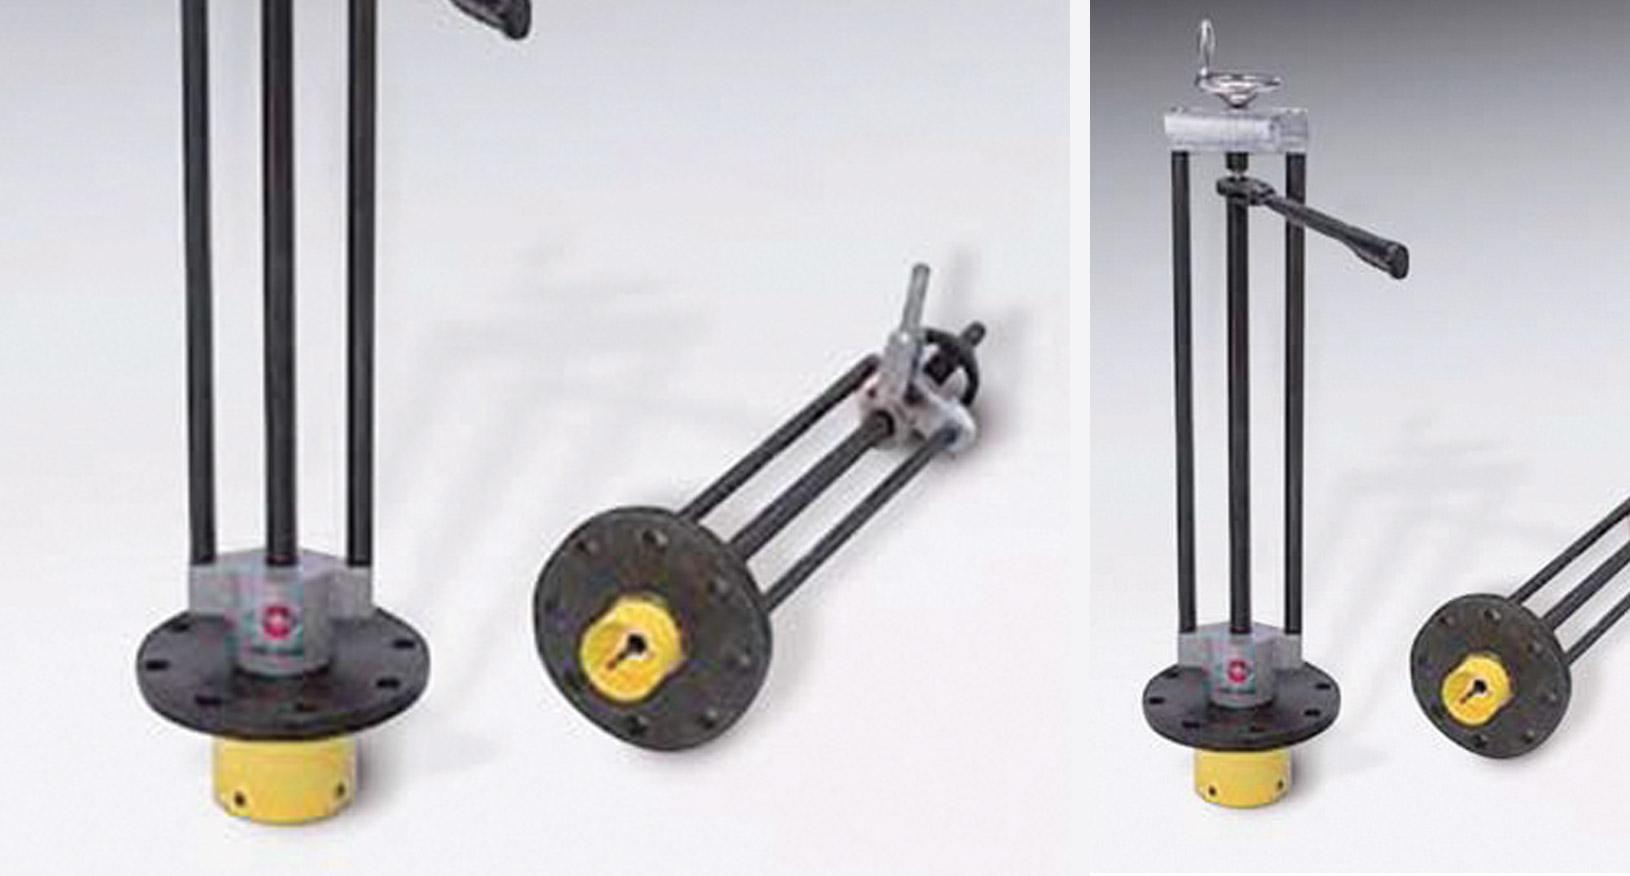 Compact 6 Under Pressure Drill